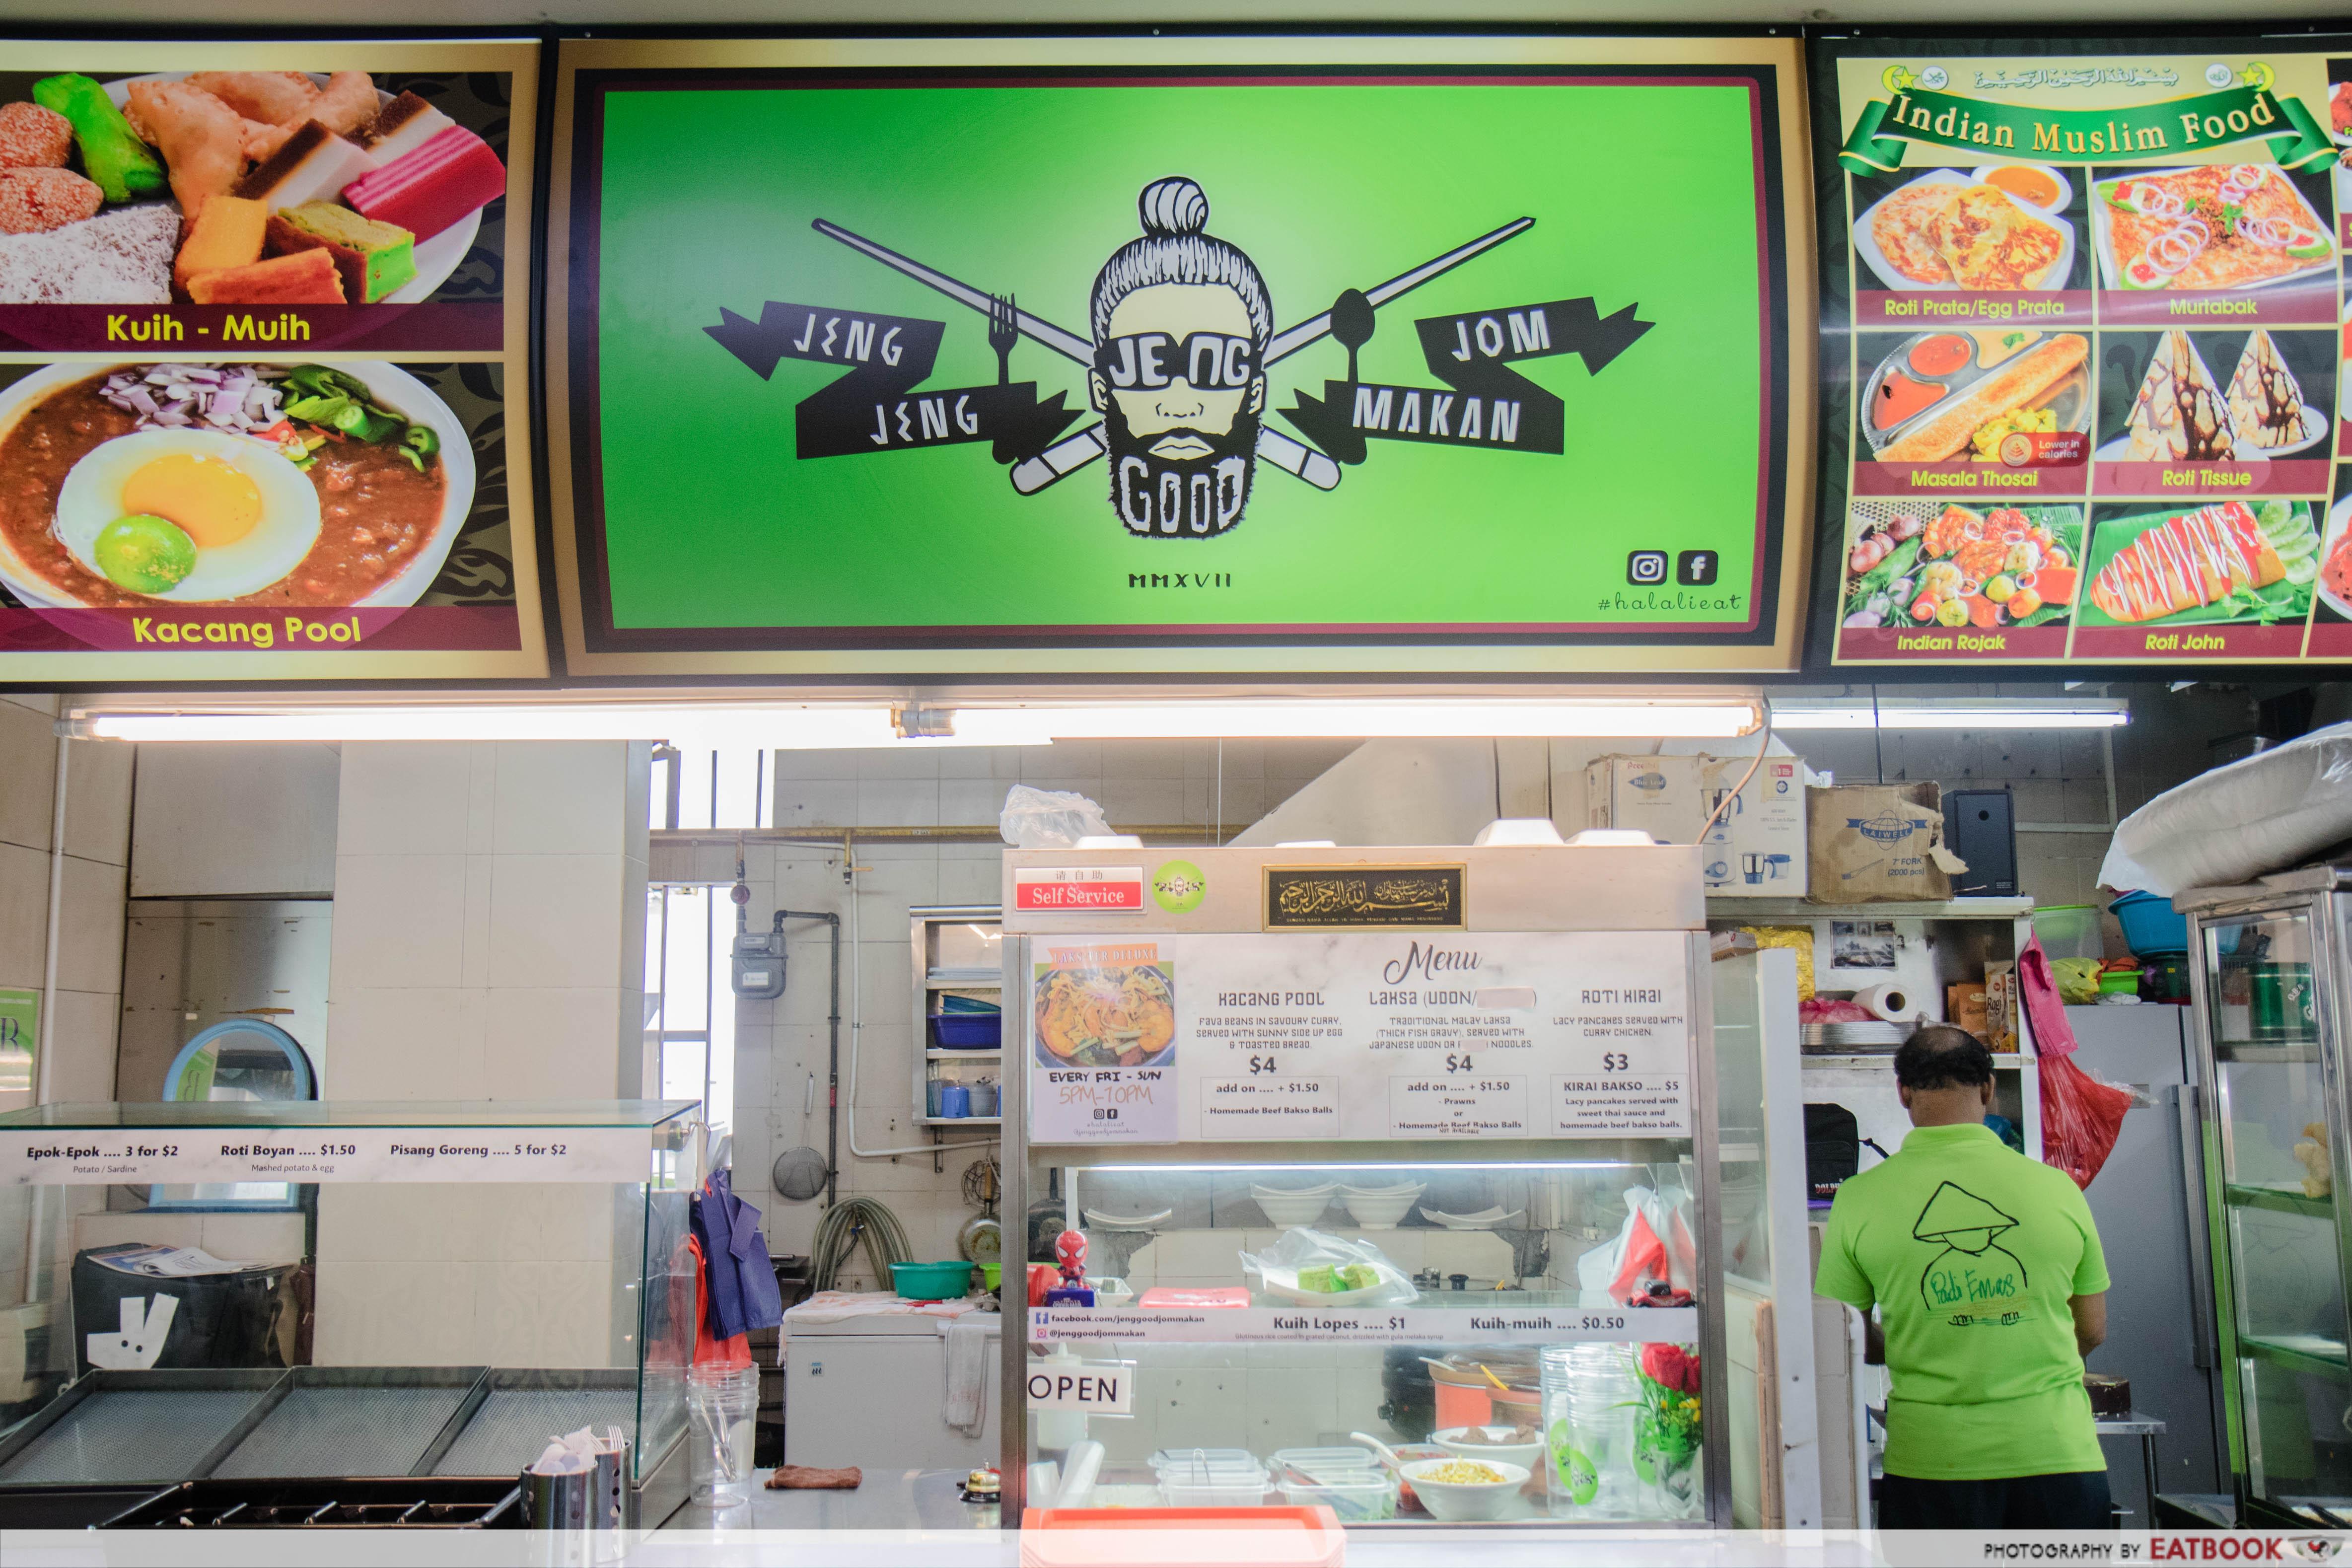 Jenggood Jom Makan - Shop front